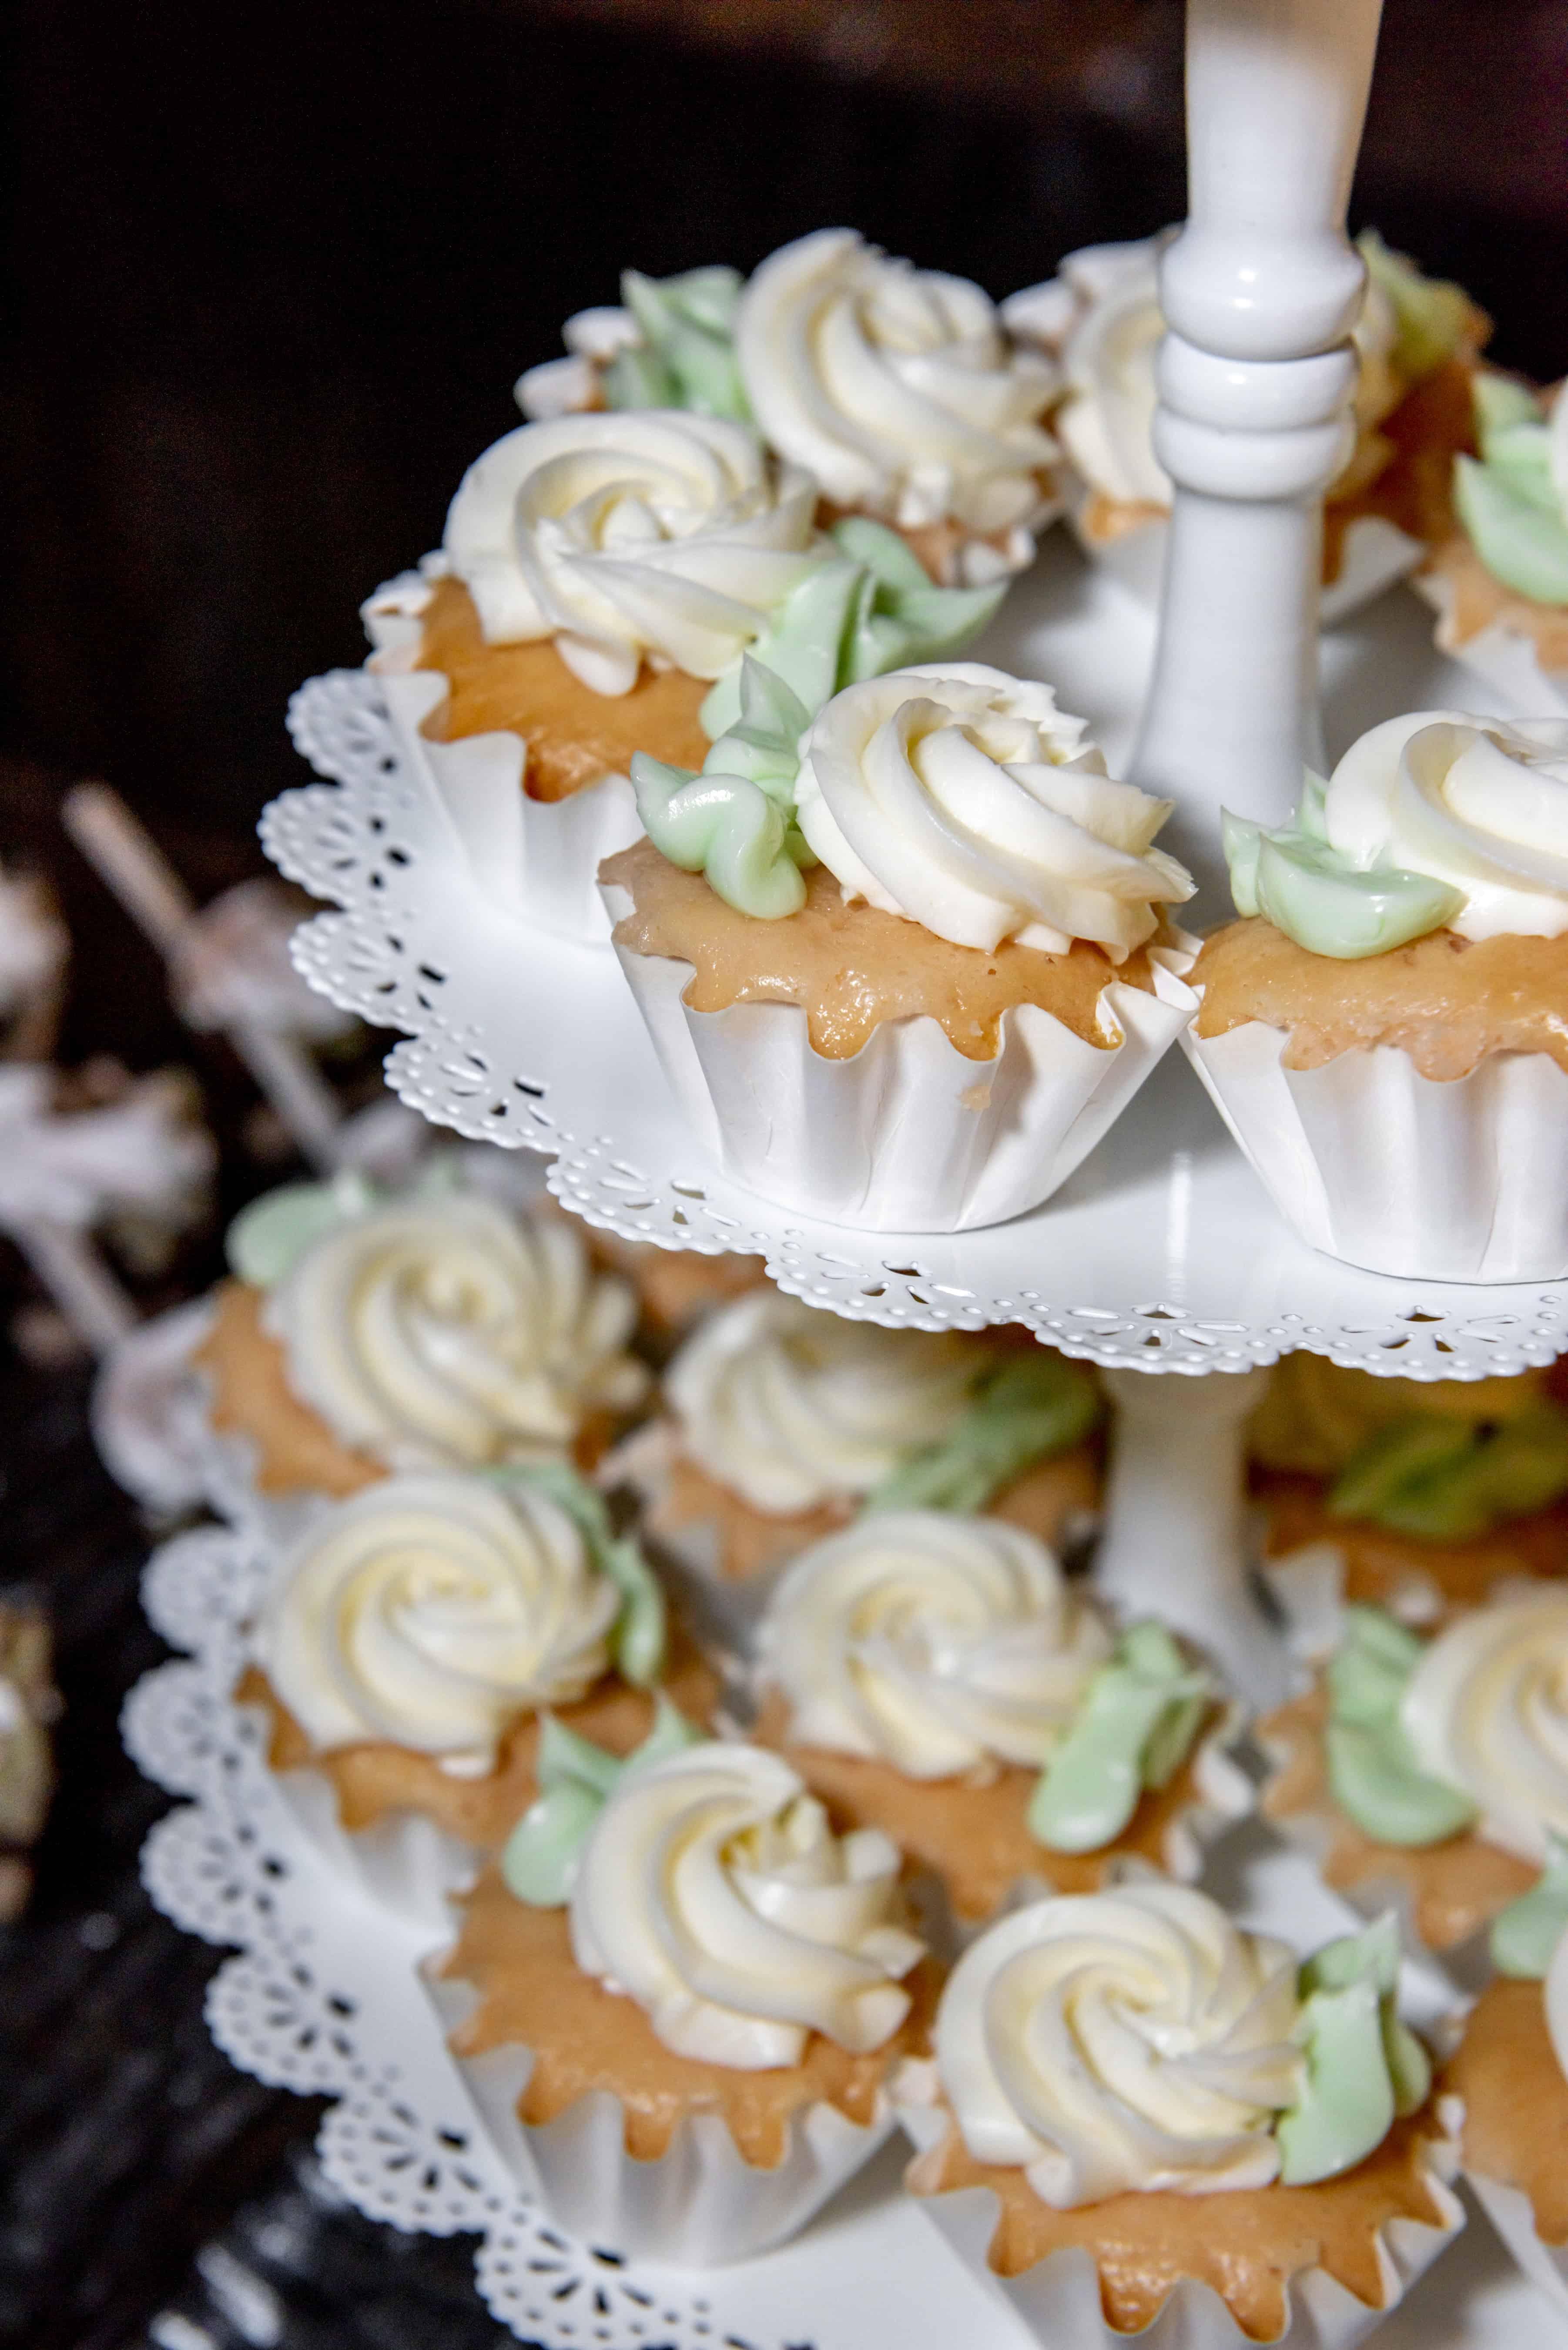 The Makery Cake Company Rose Swirl Cupcakes